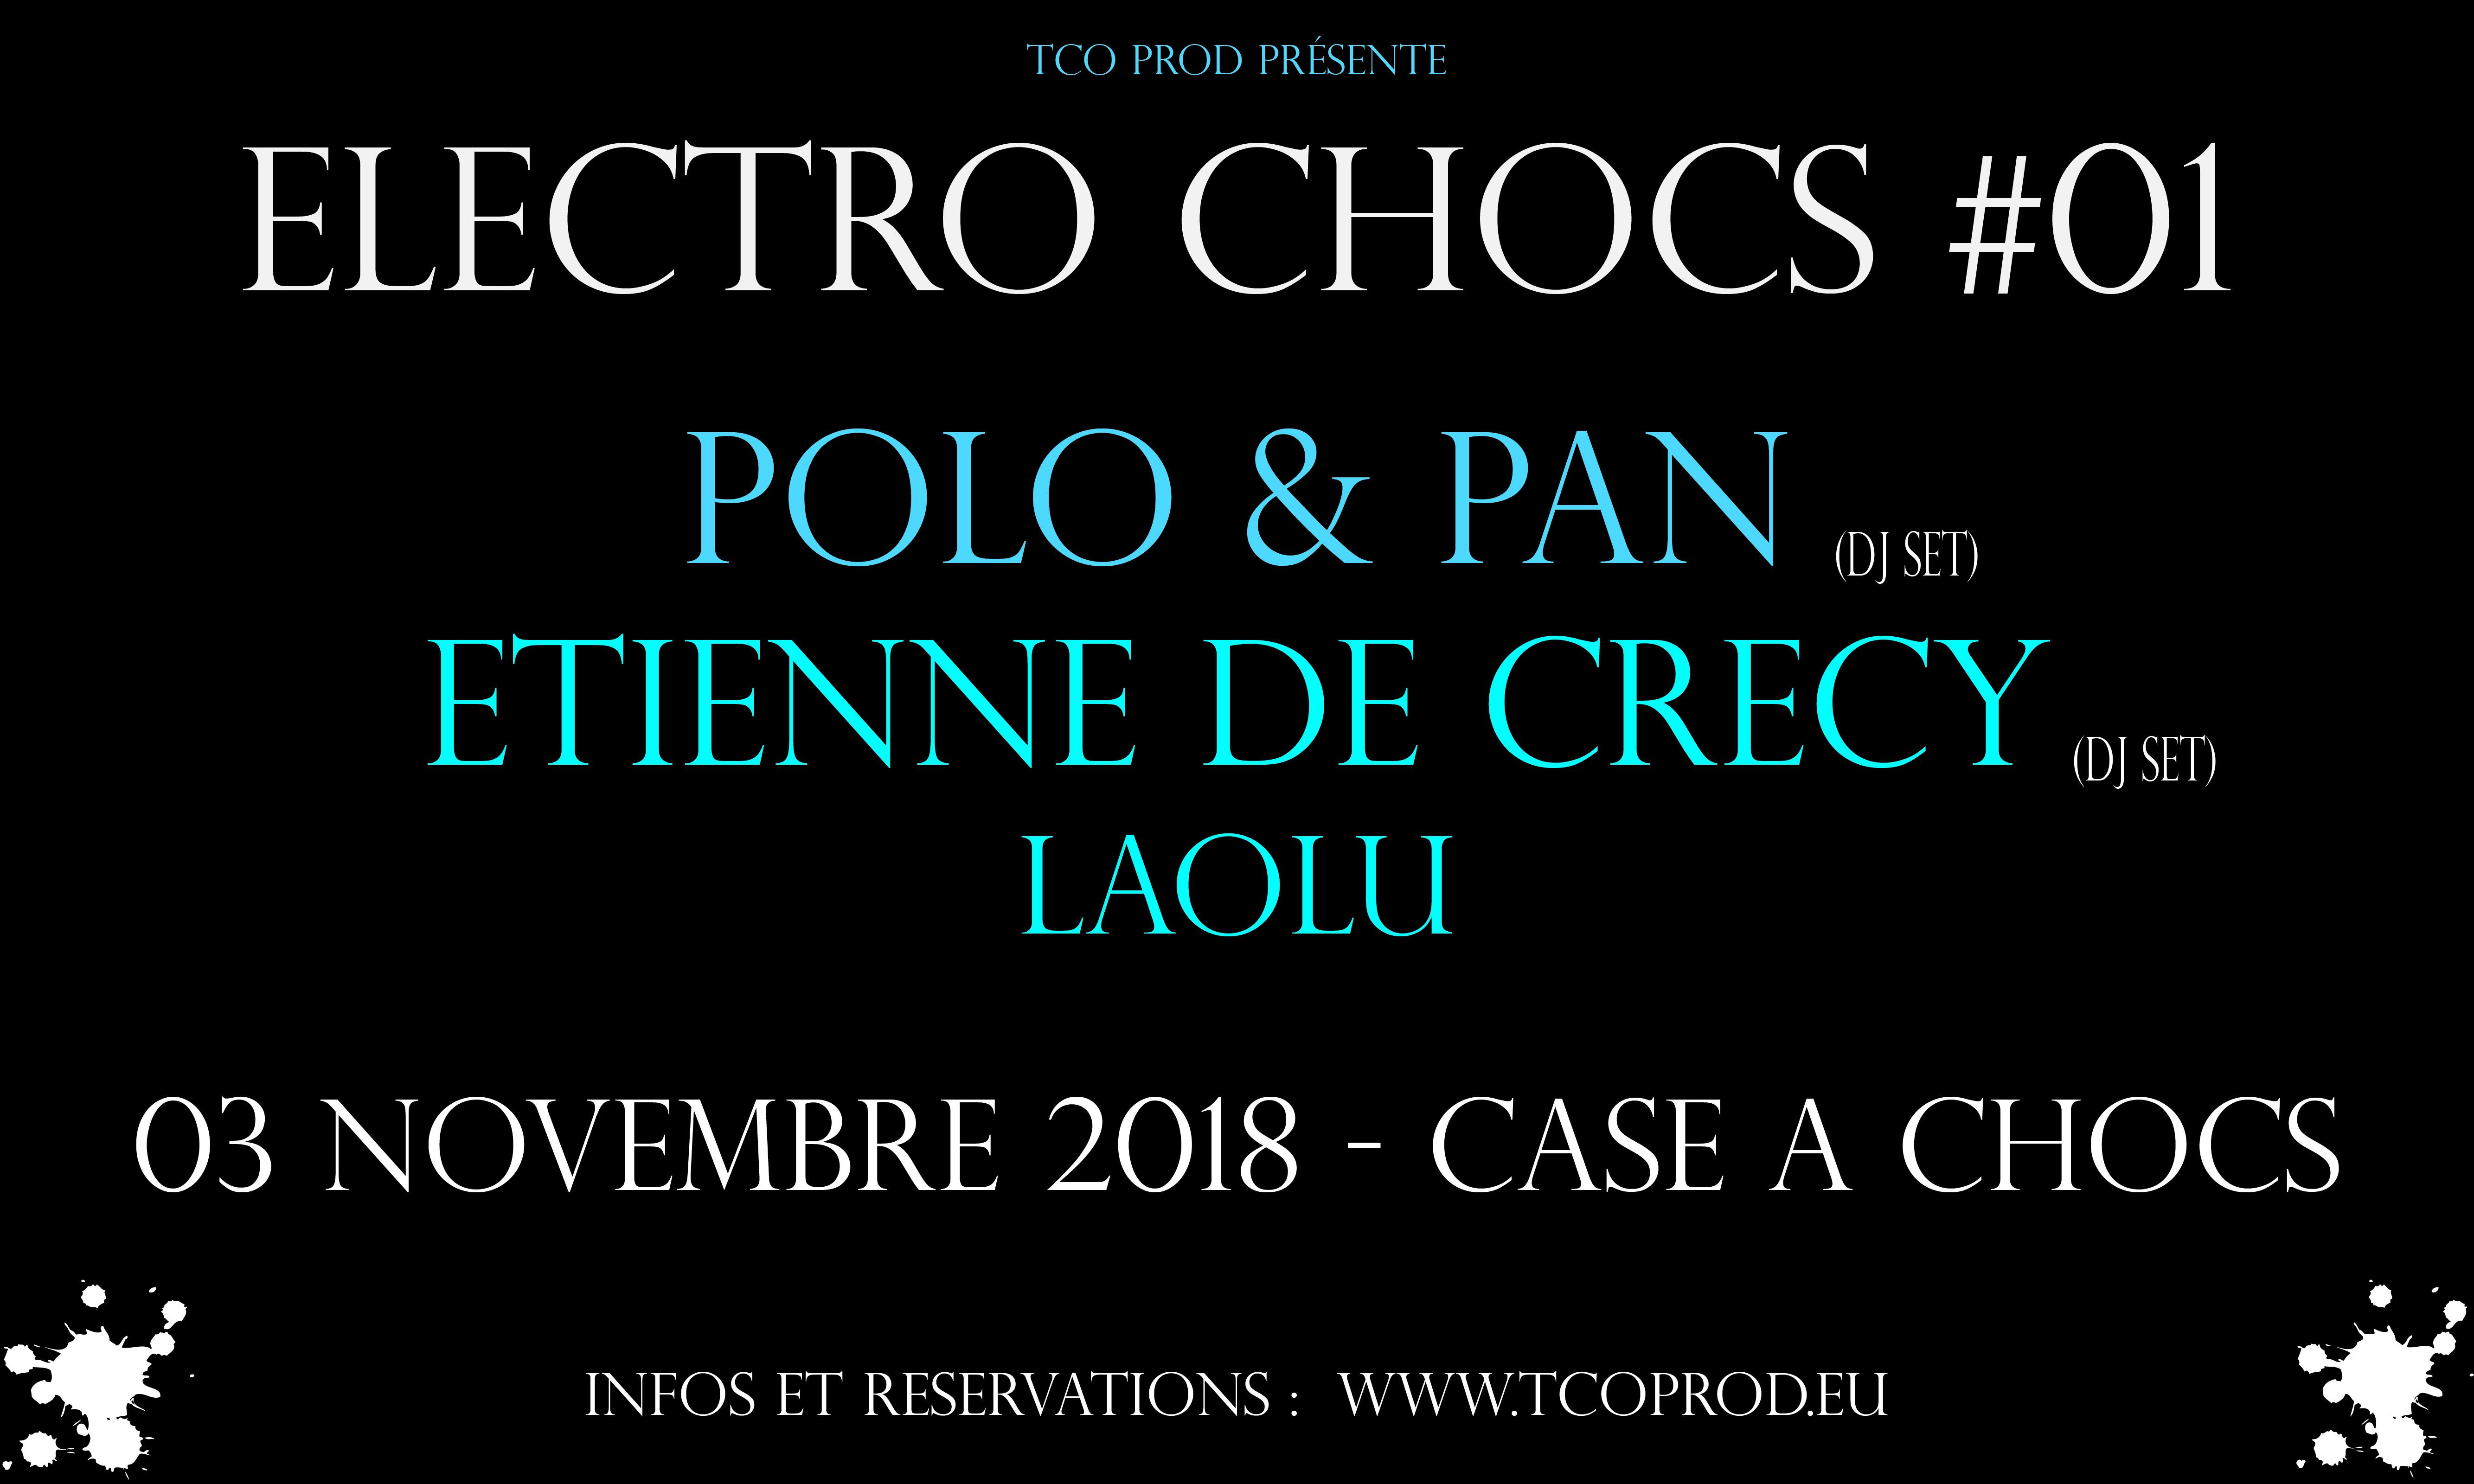 Electro Chocs #01 / Polo&Pan-EDC-Laolu